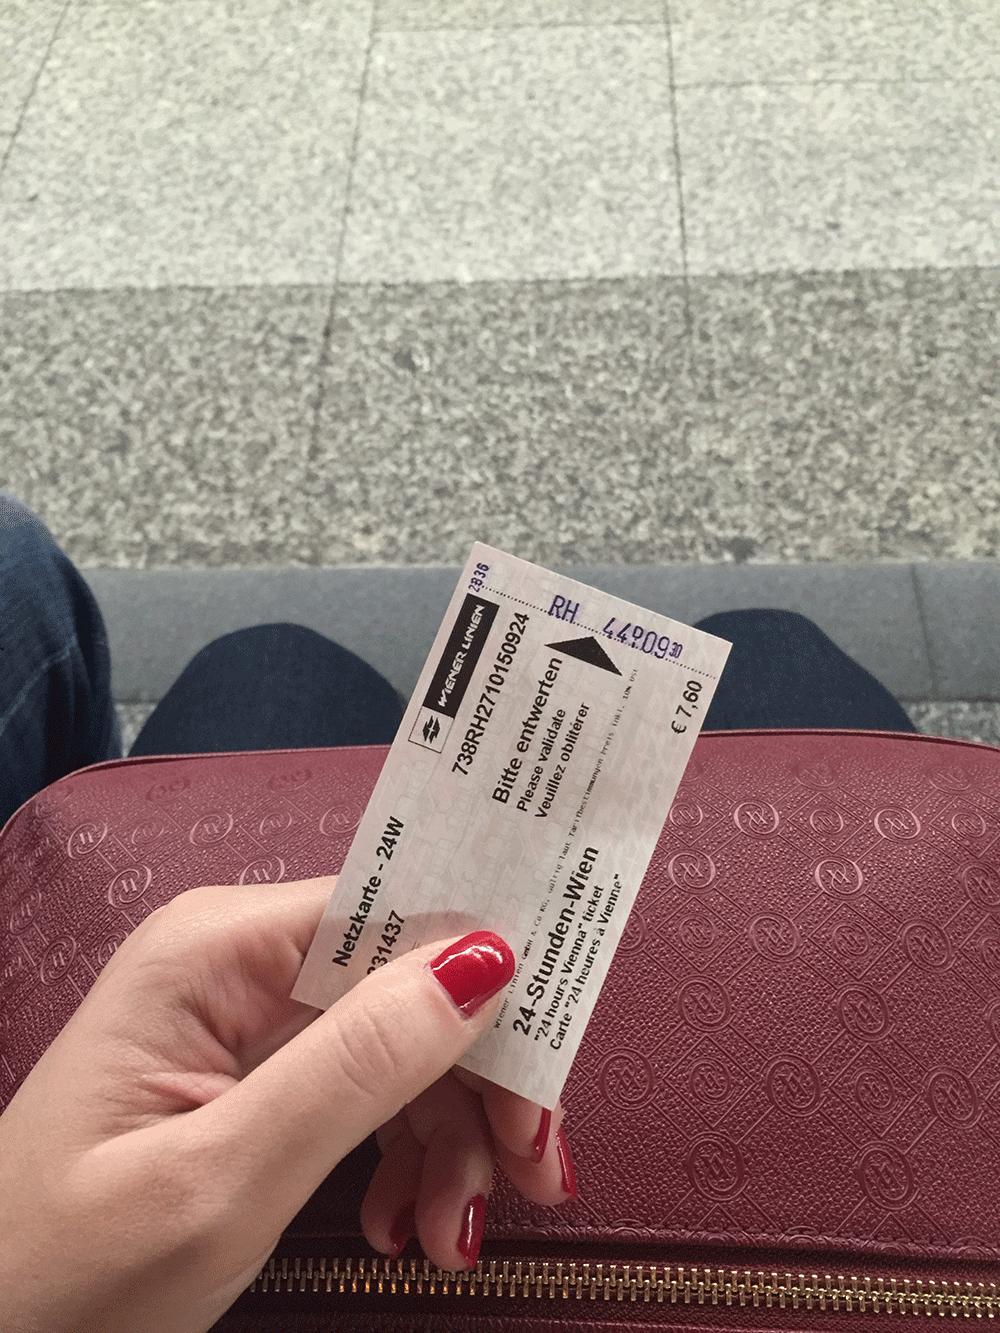 Ulaşım bileti